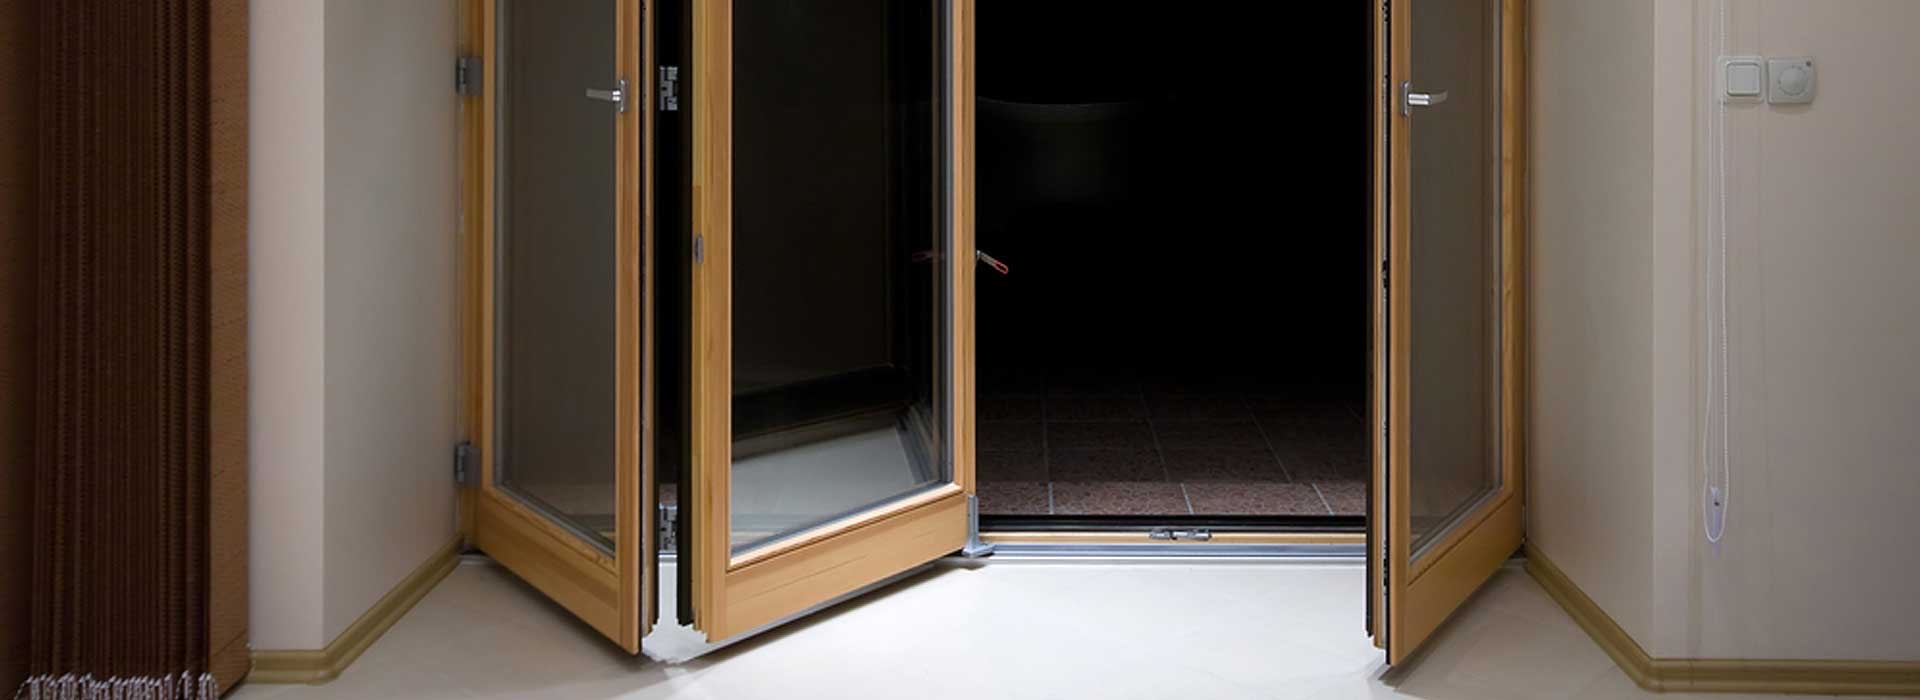 uPVC Bi-Fold Doors Sidcup